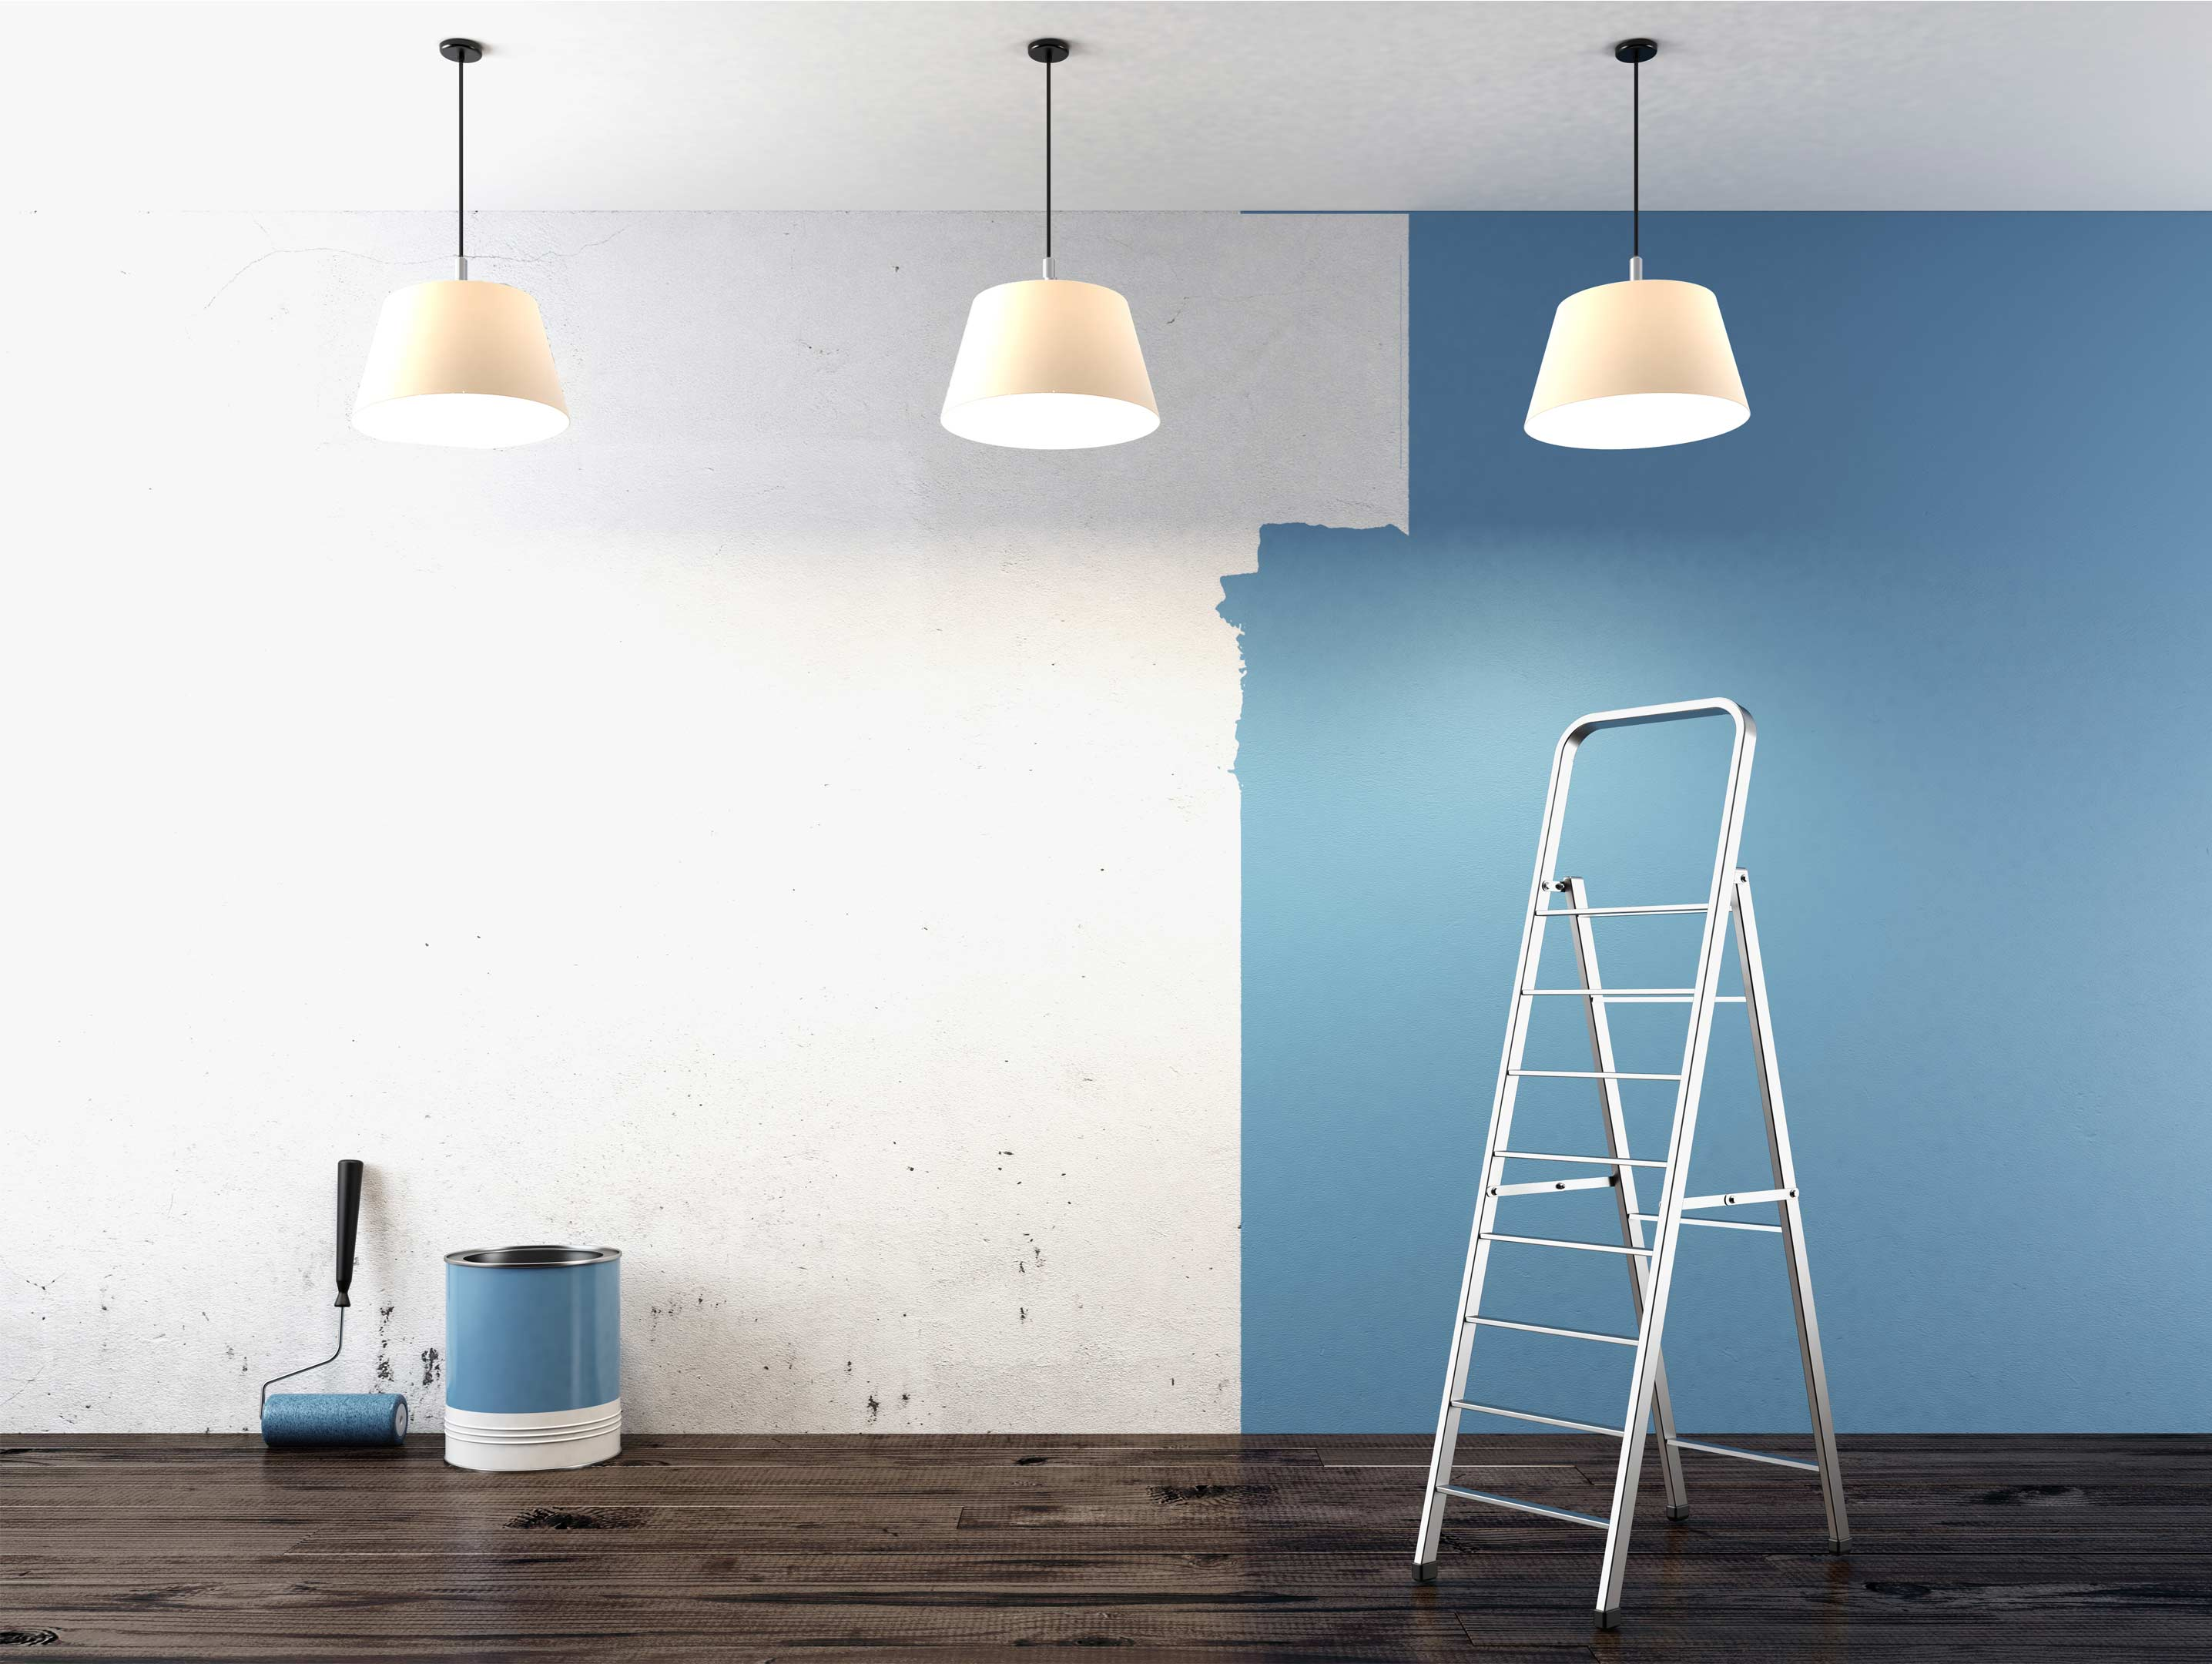 paintingwall